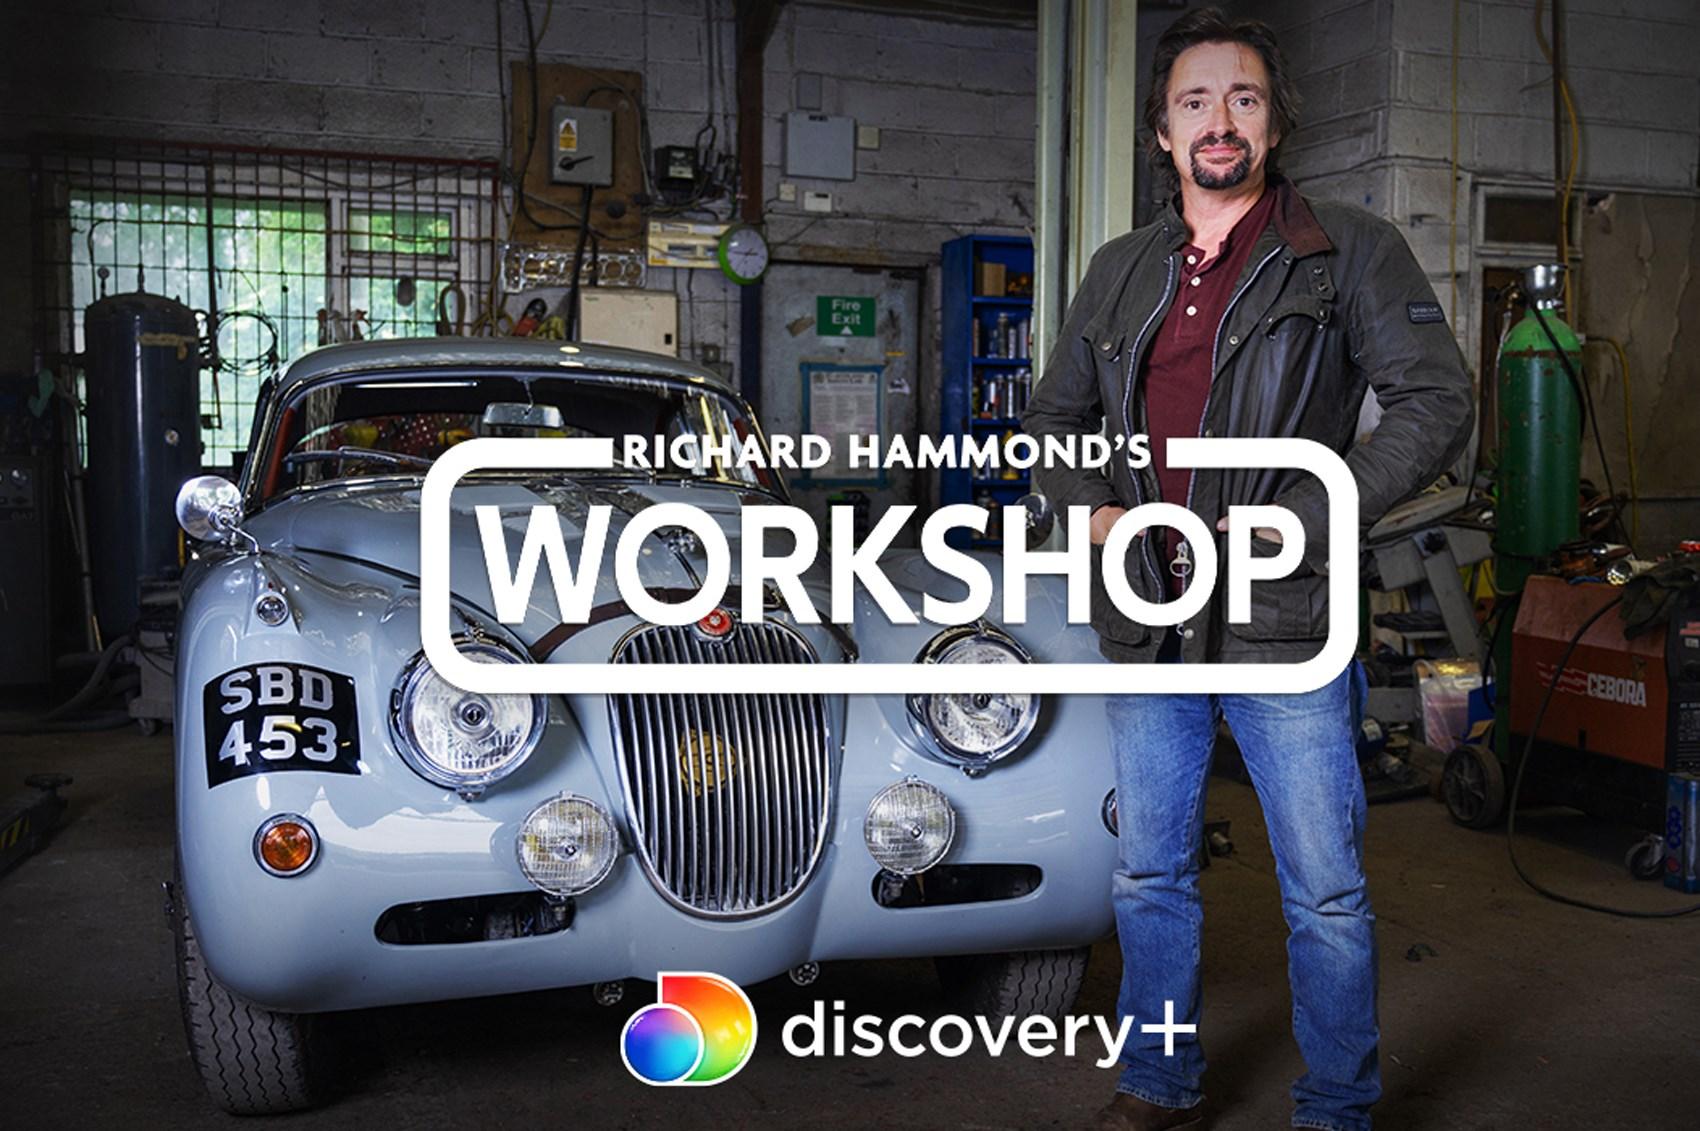 Richard Hammond wants to help fix YOUR car!